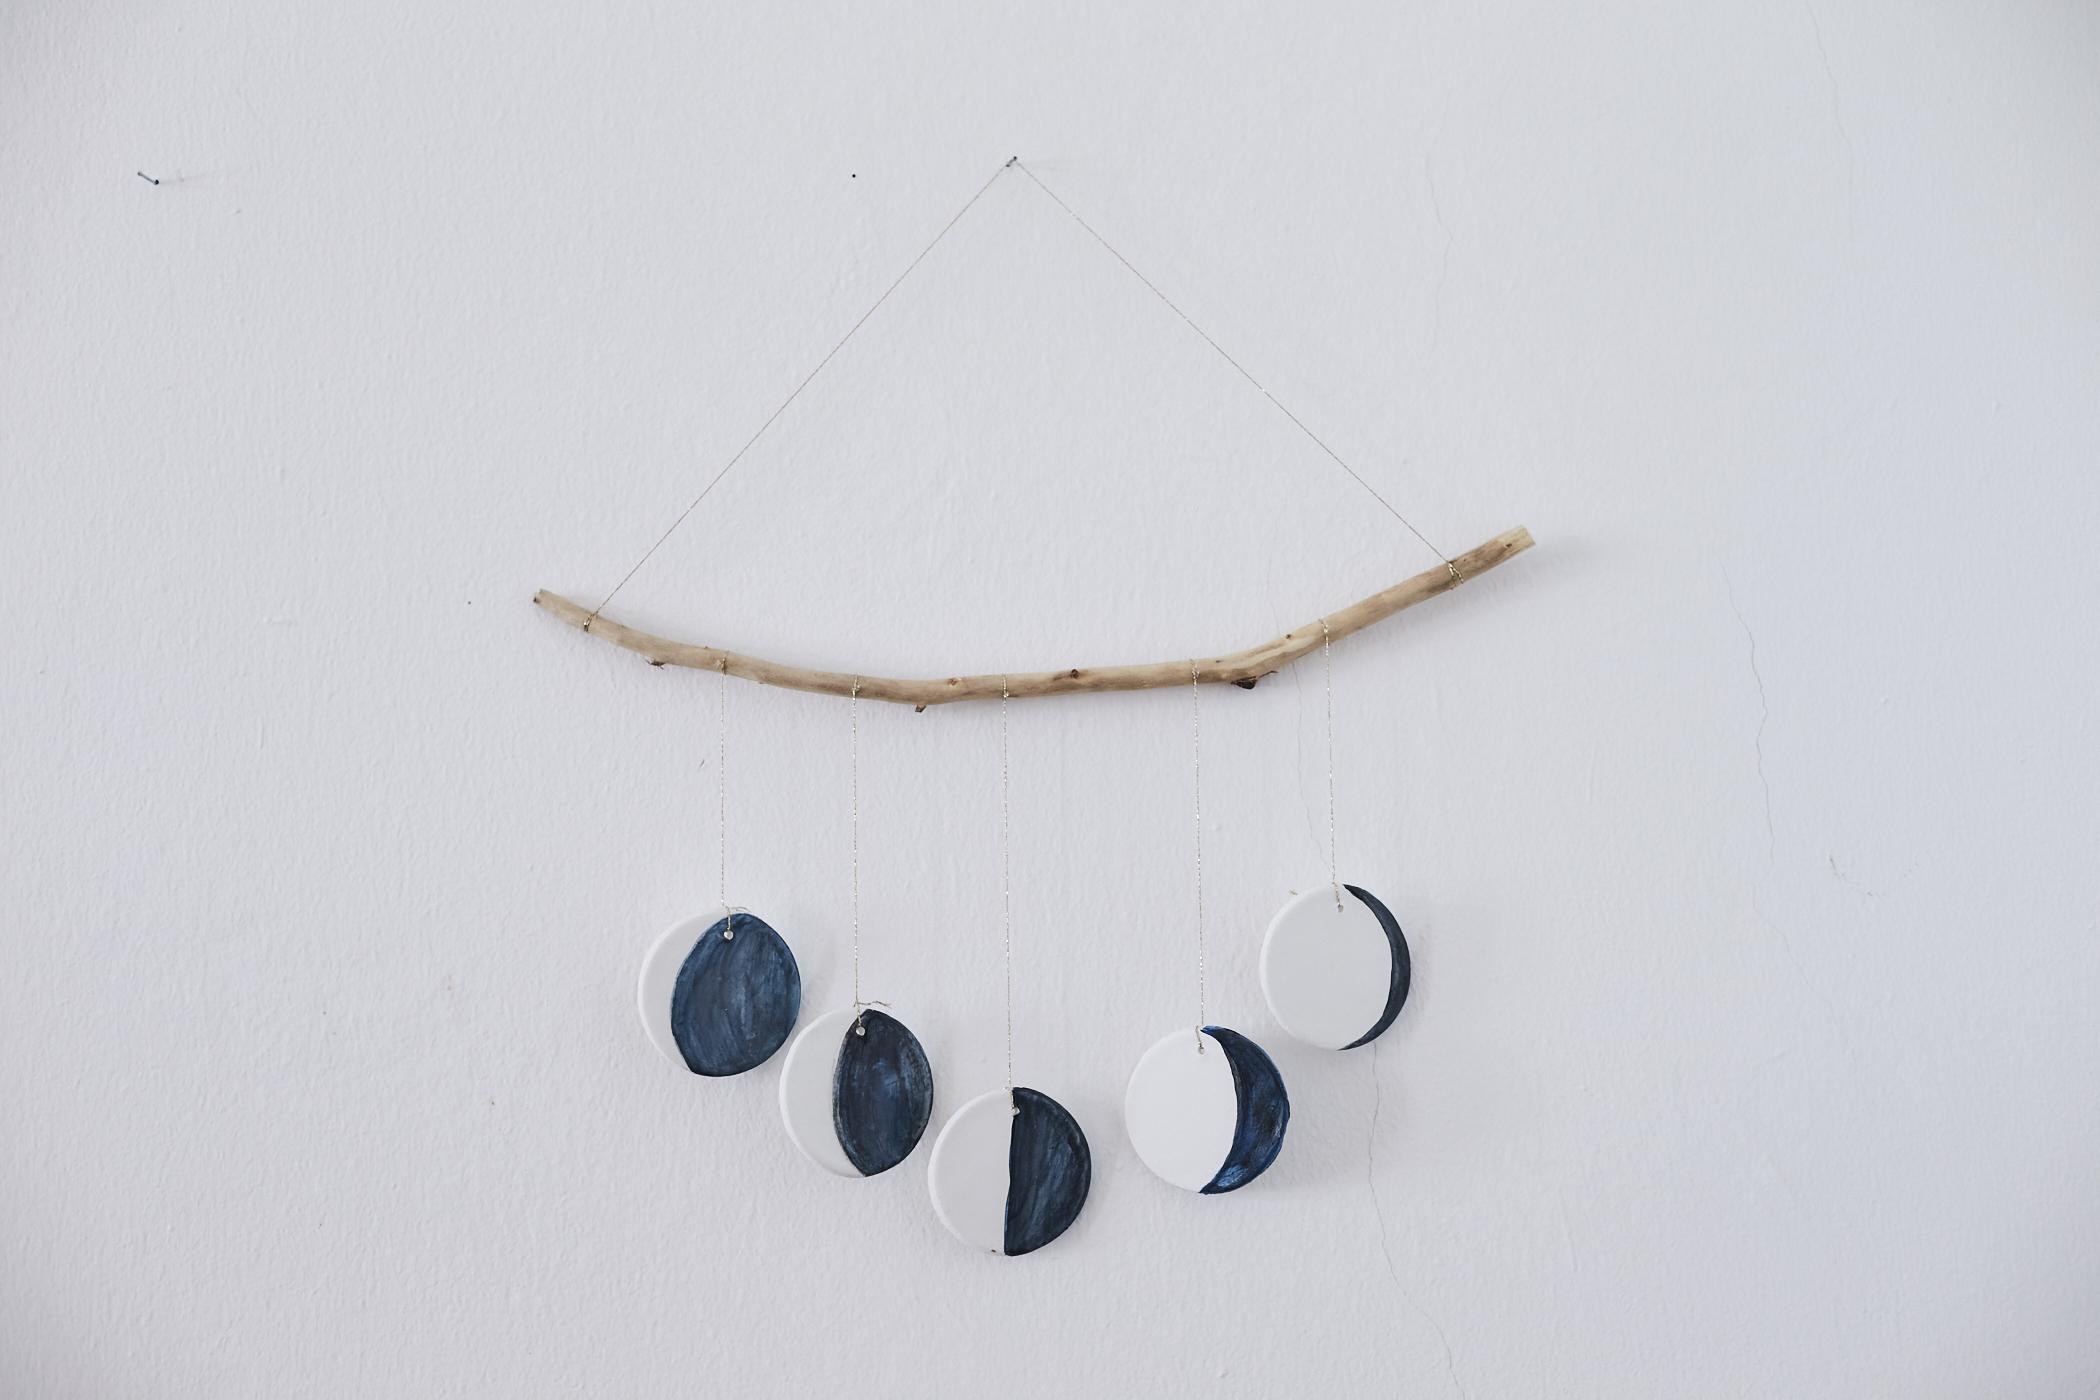 femtastics-Mobile-Mondphasen